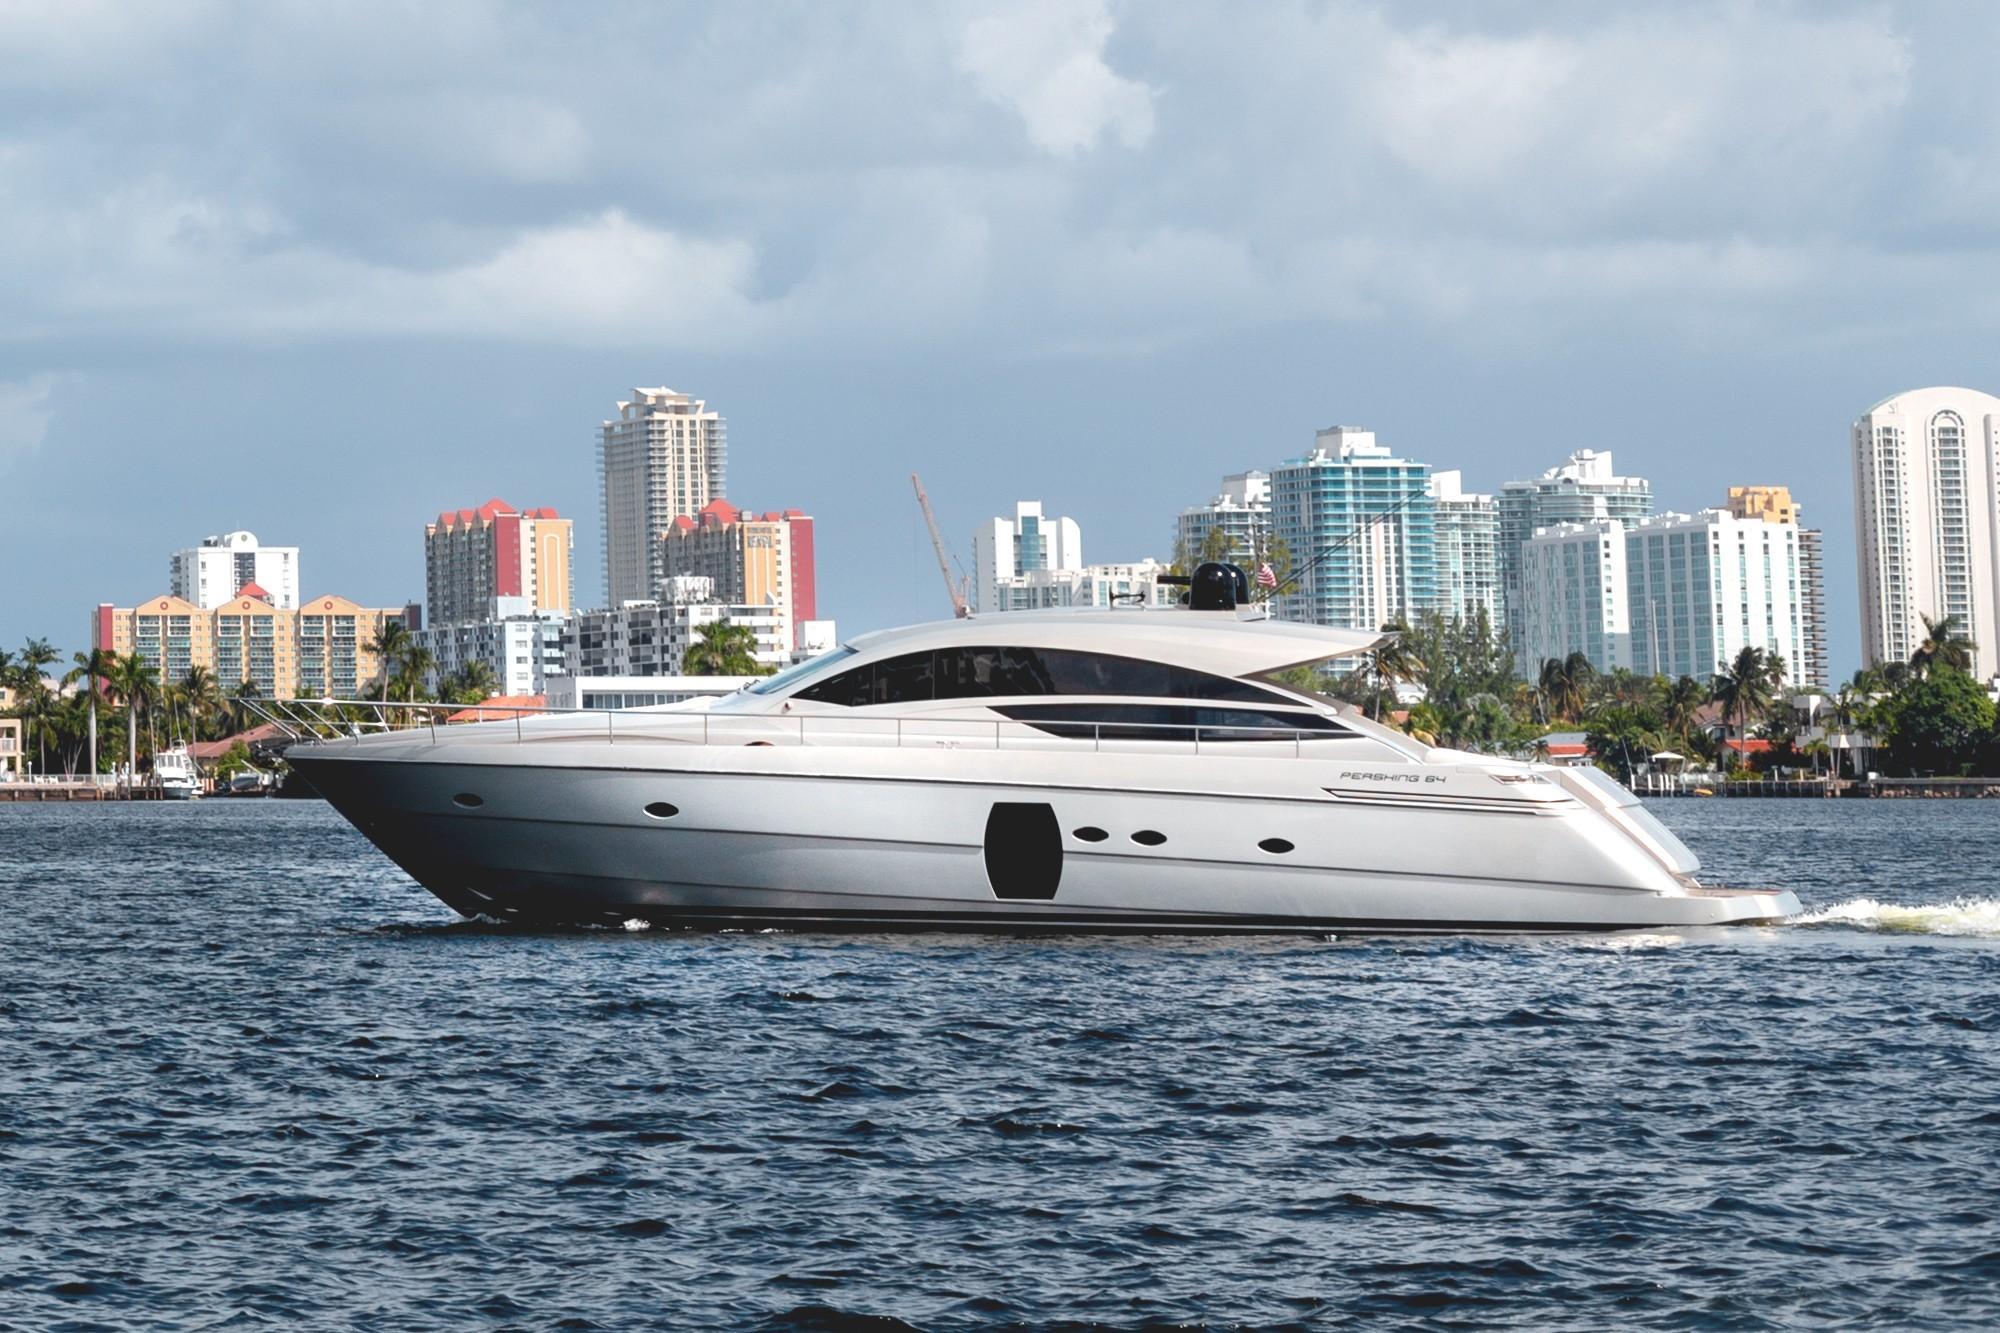 2013 Pershing Yachts 64 ''Scorpio III